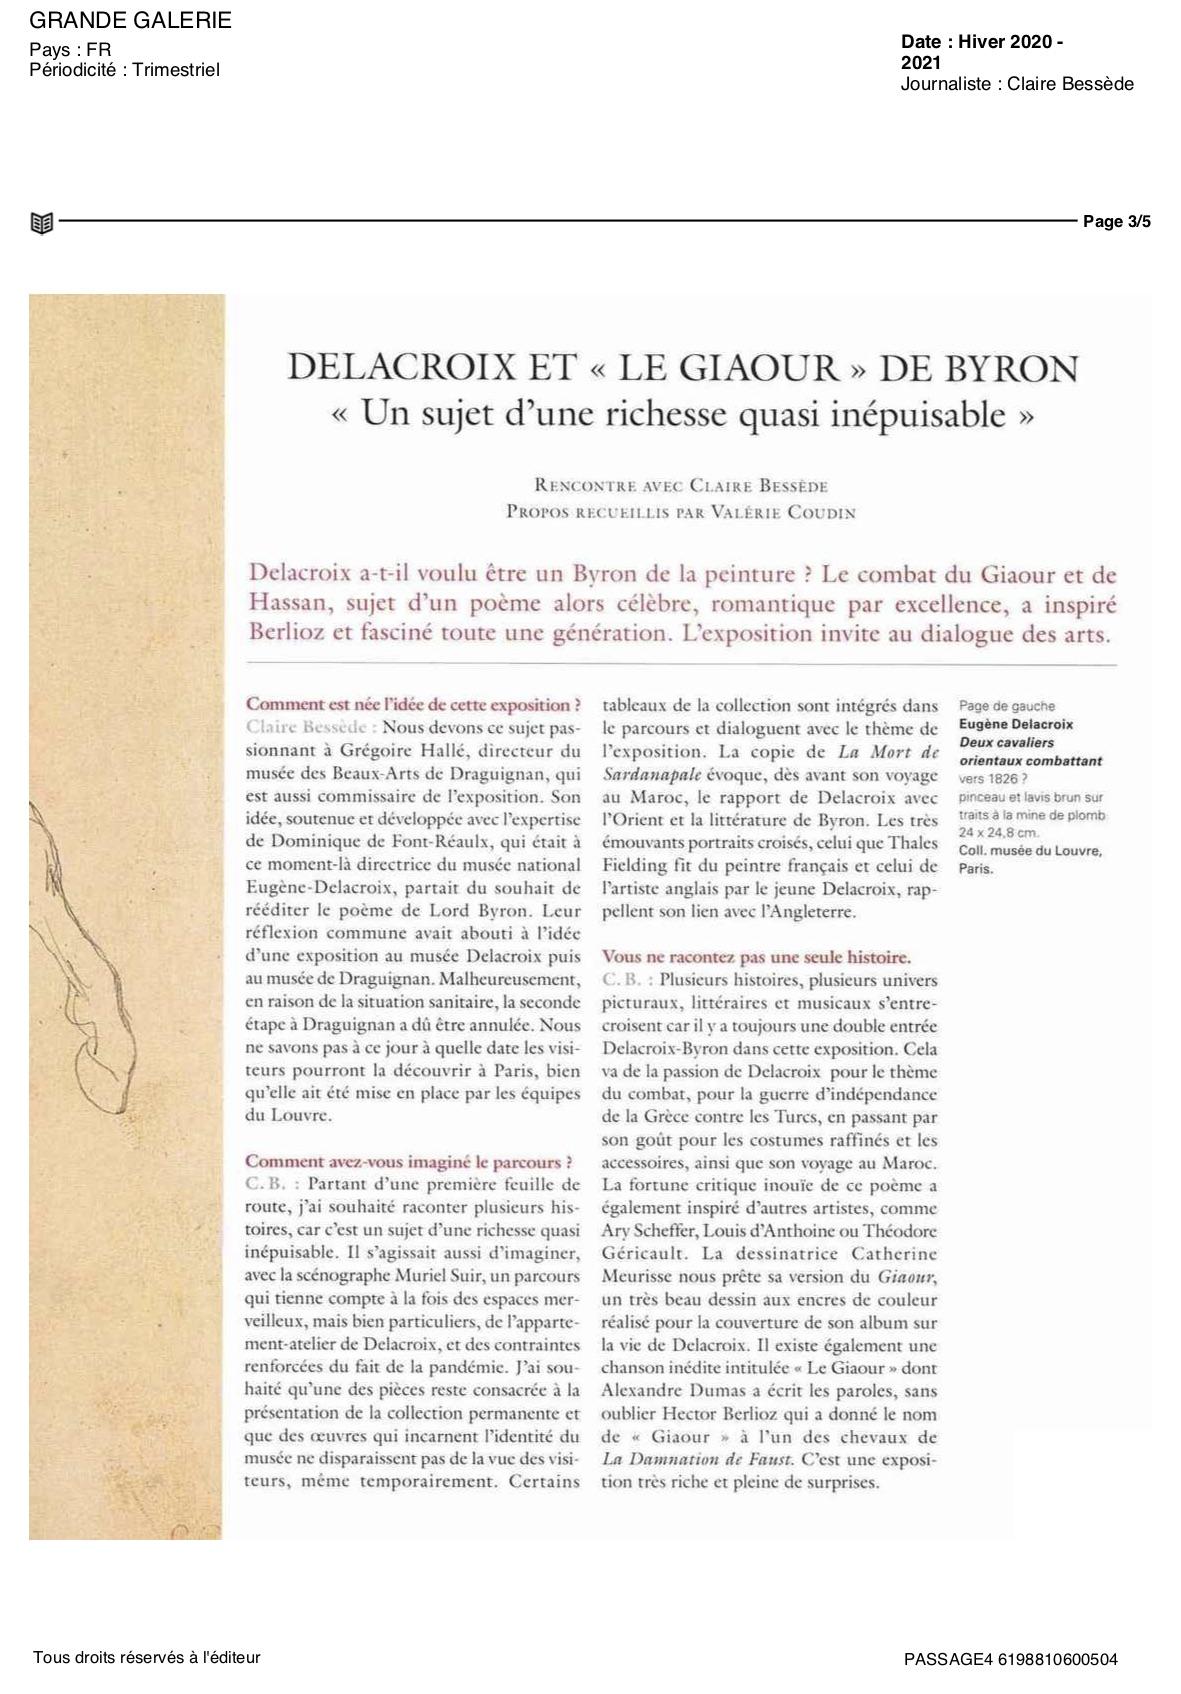 2020-11-30-GRANDE GALERIE-Hiver 2020 - 2021-3